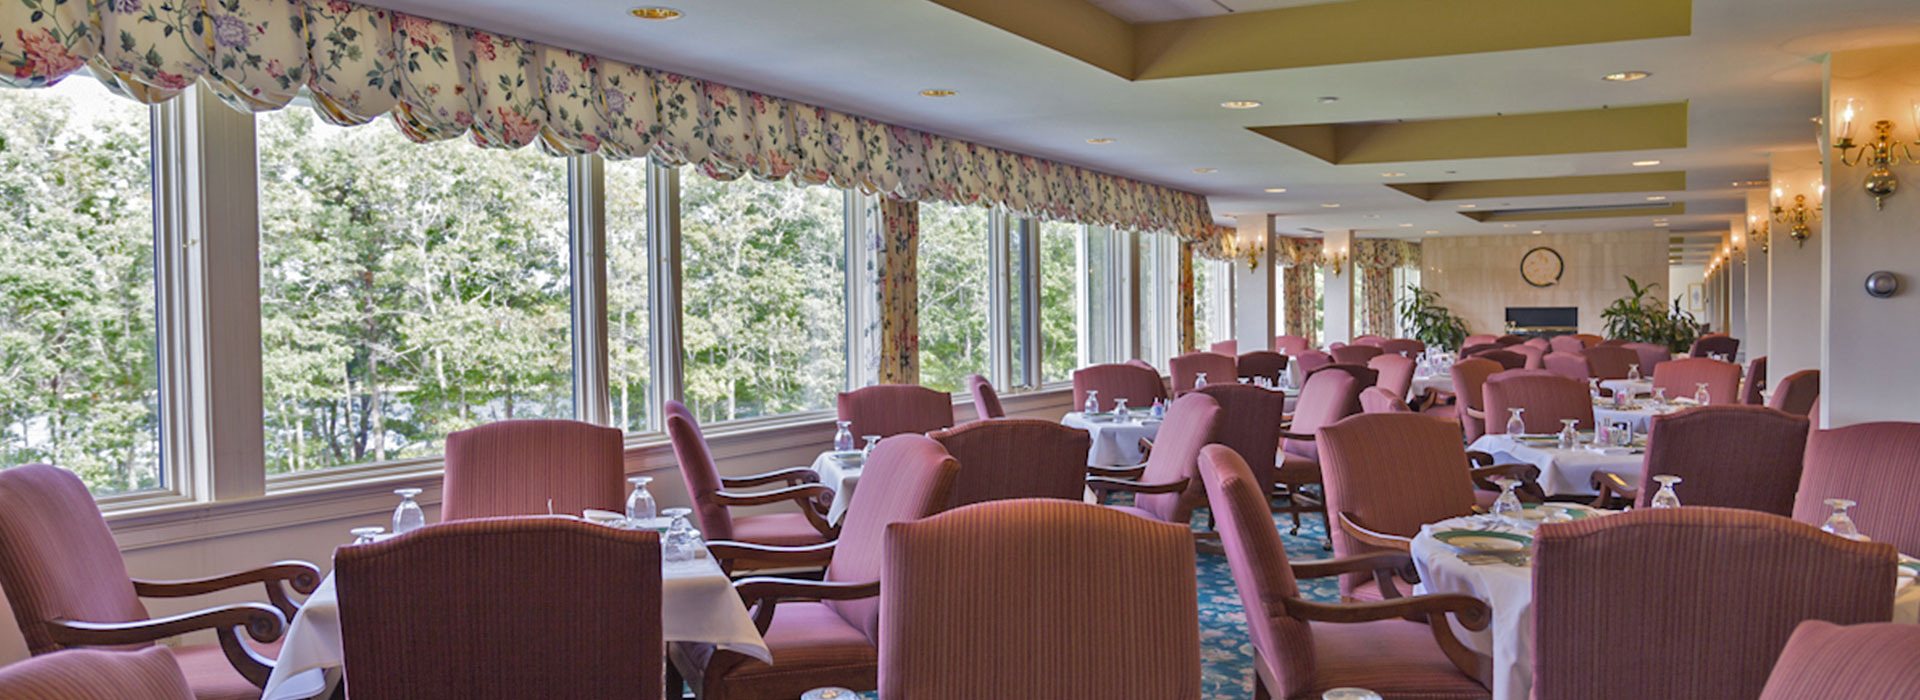 Thirwood Place main dining room